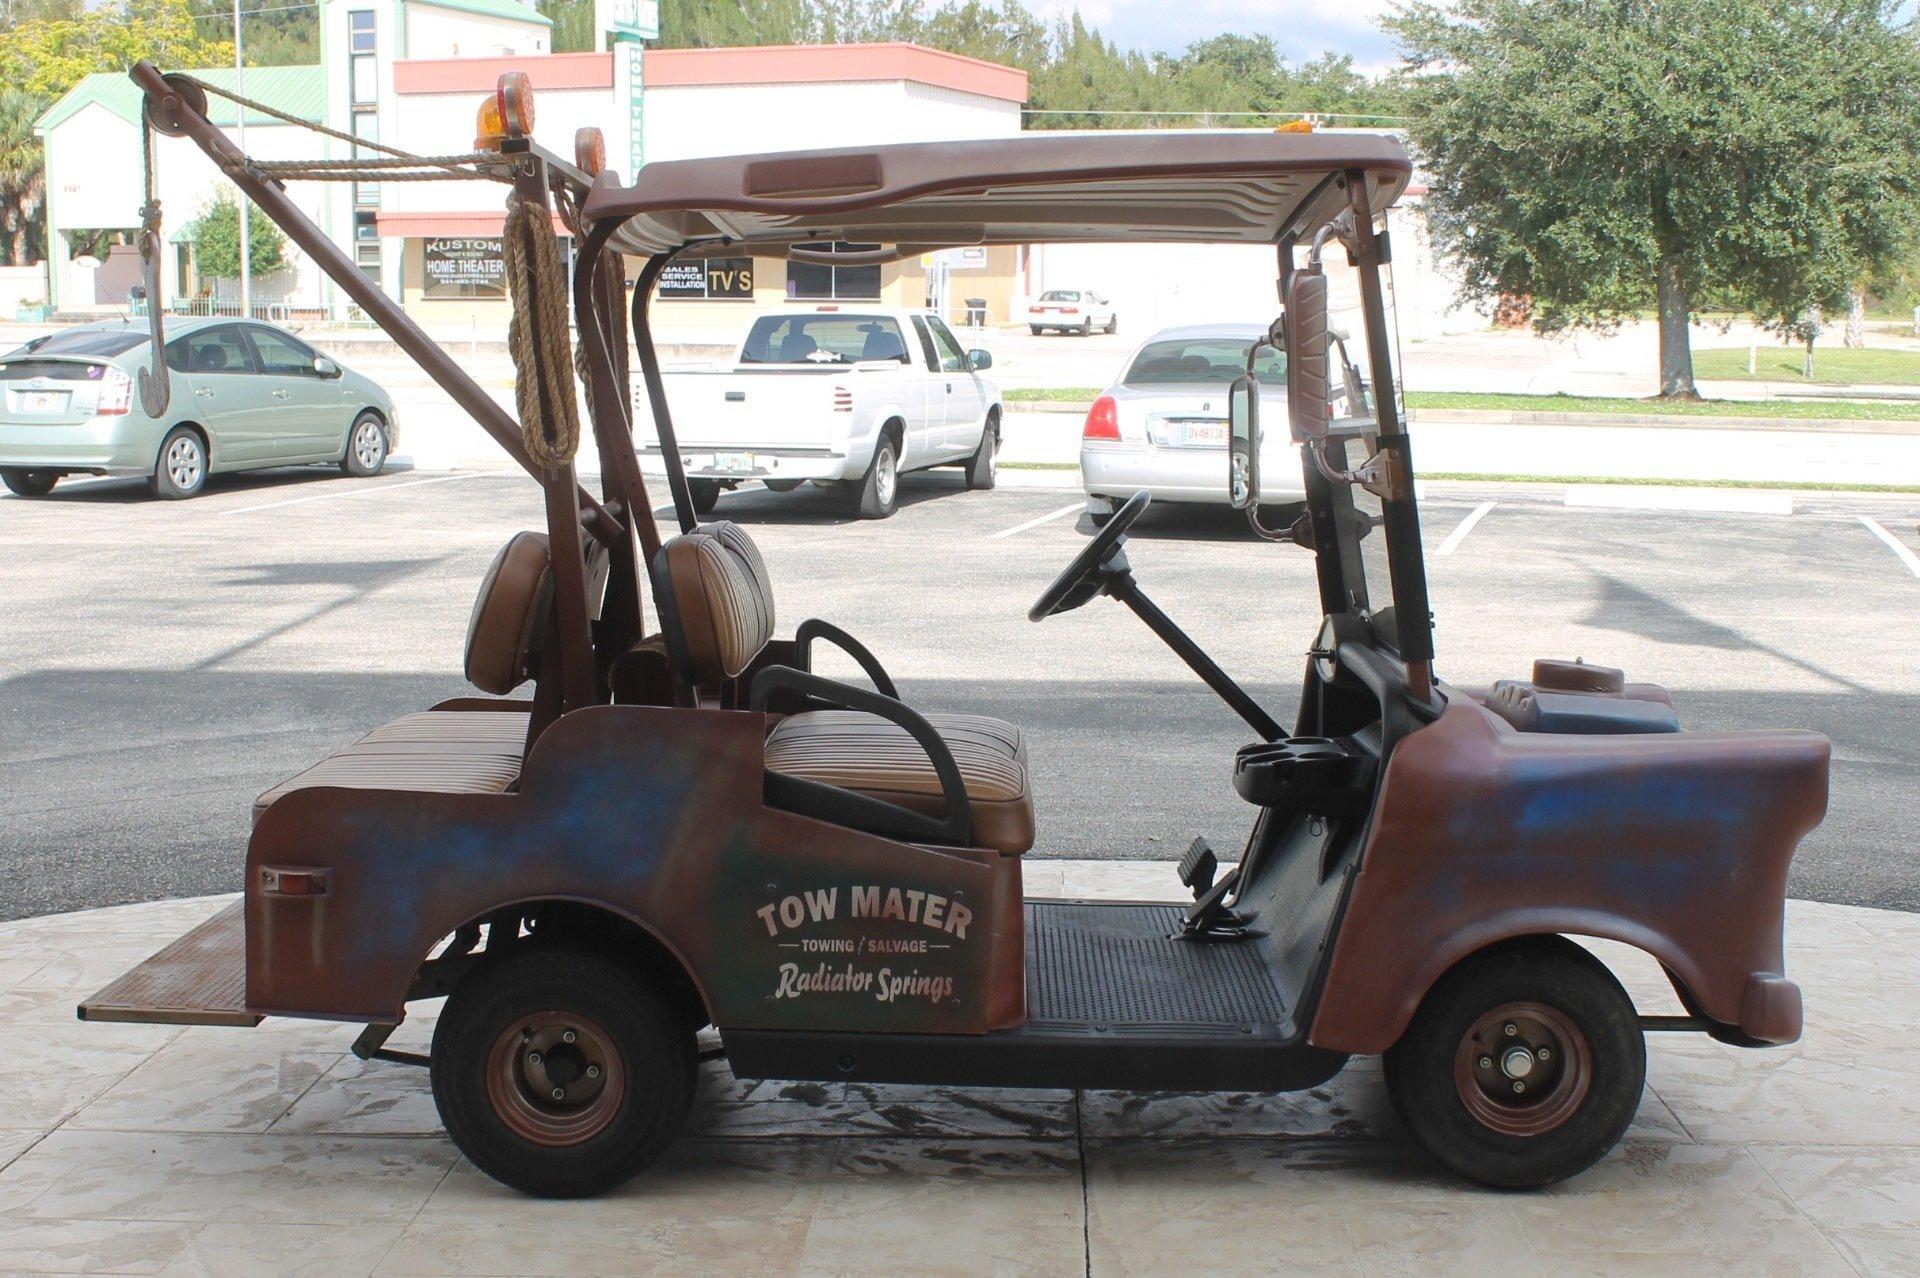 Ezgo Golf Cart Parts In Ontario Elegant Windsor The Best Html on